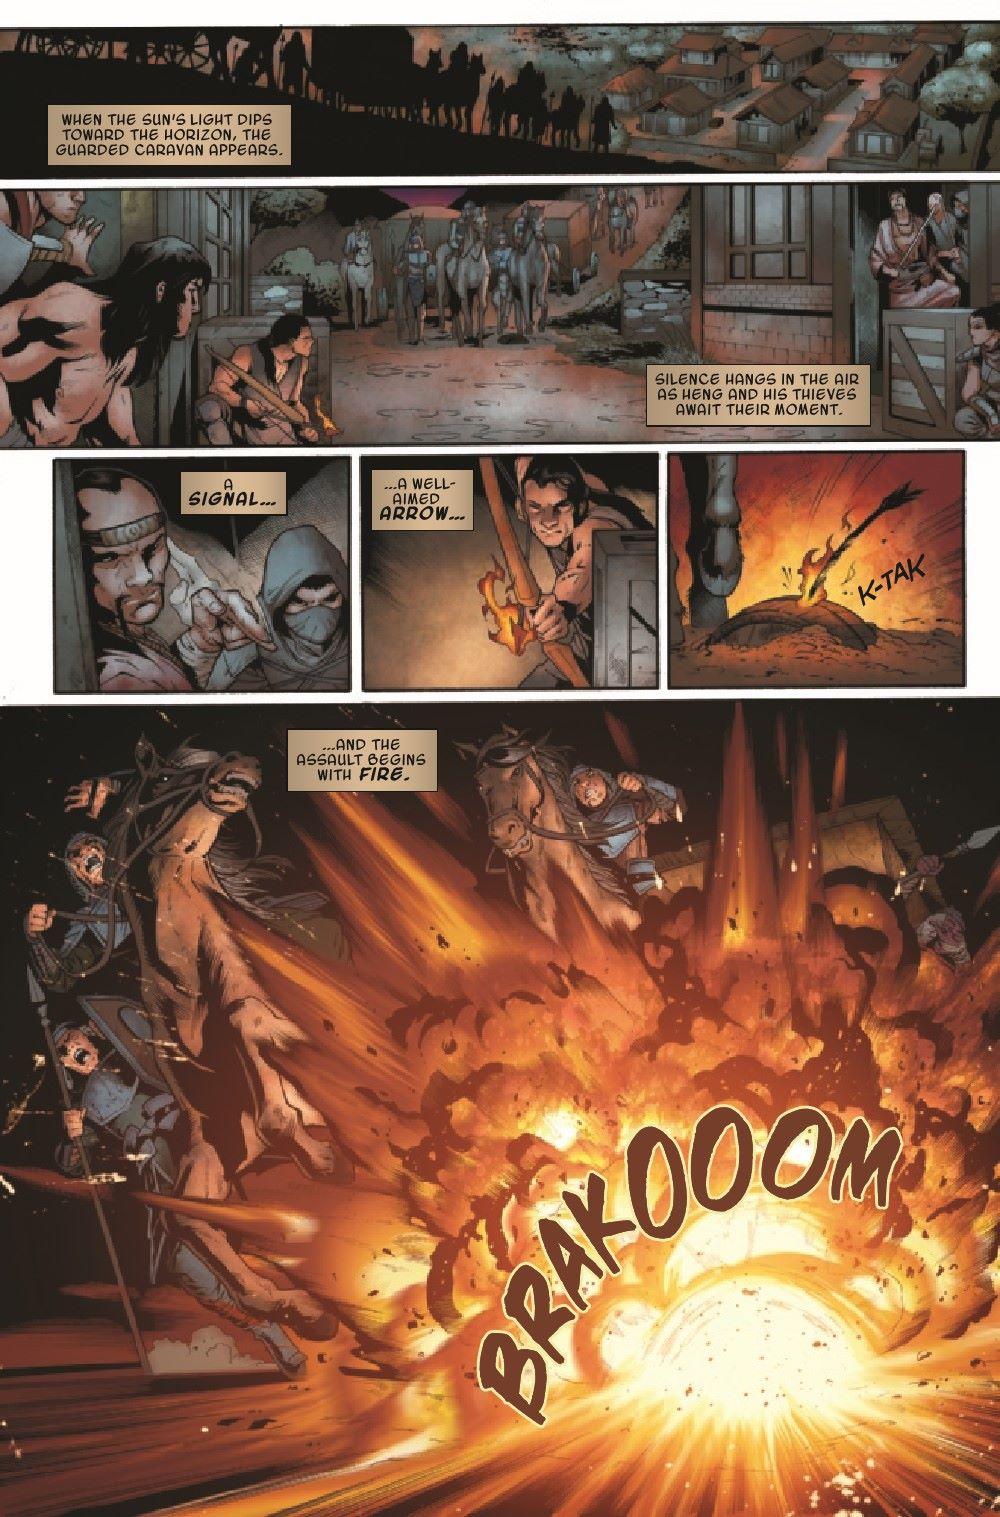 CONANBARB2019021_Preview-4 ComicList Previews: CONAN THE BARBARIAN #21